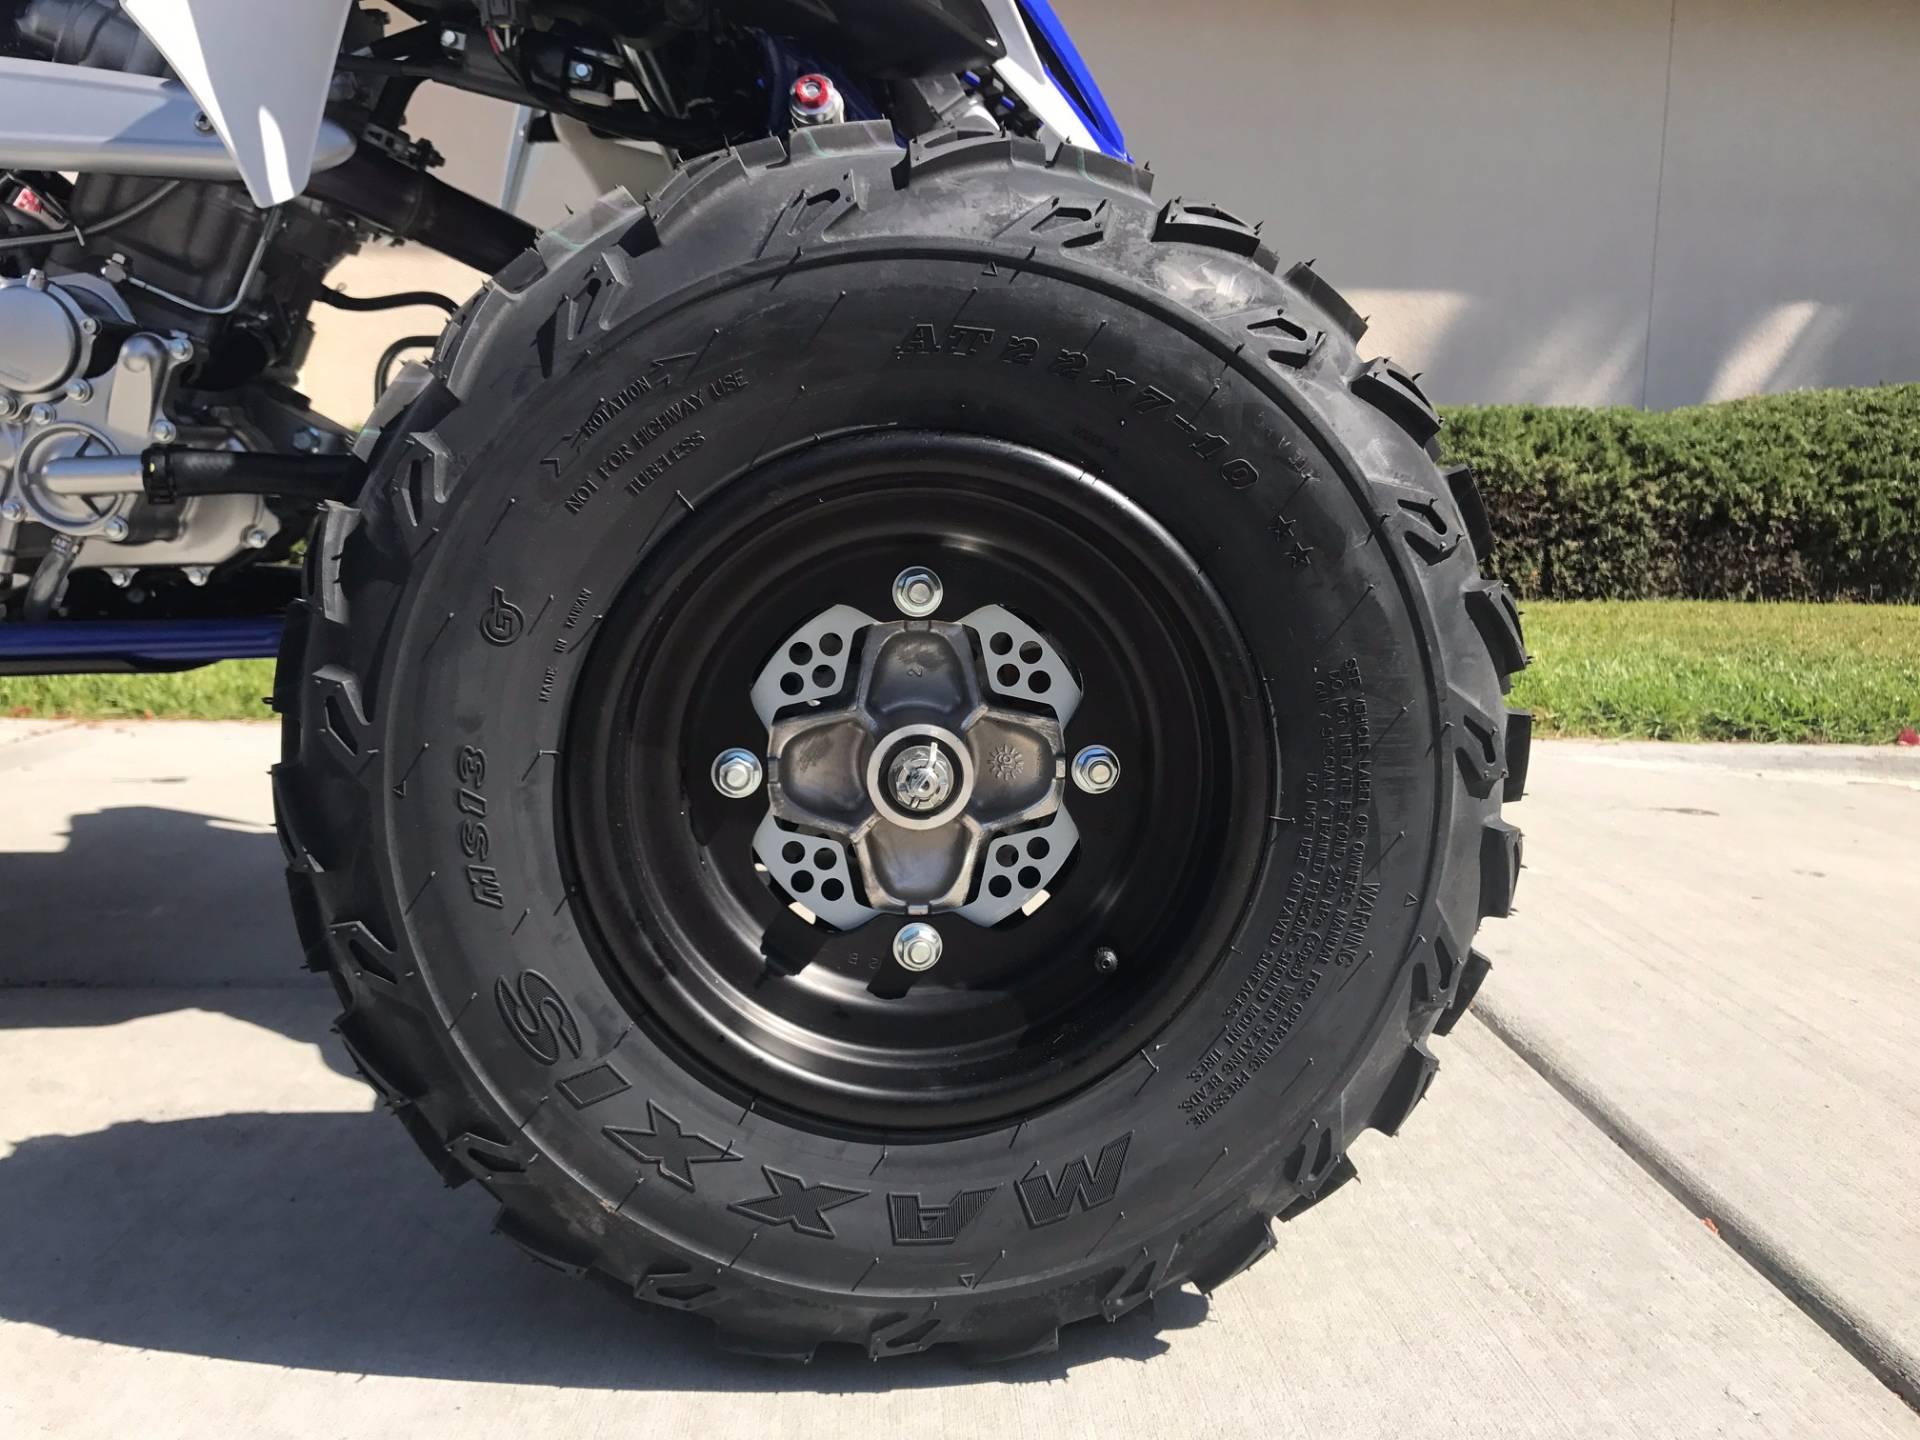 2017 Yamaha Raptor 700R 11